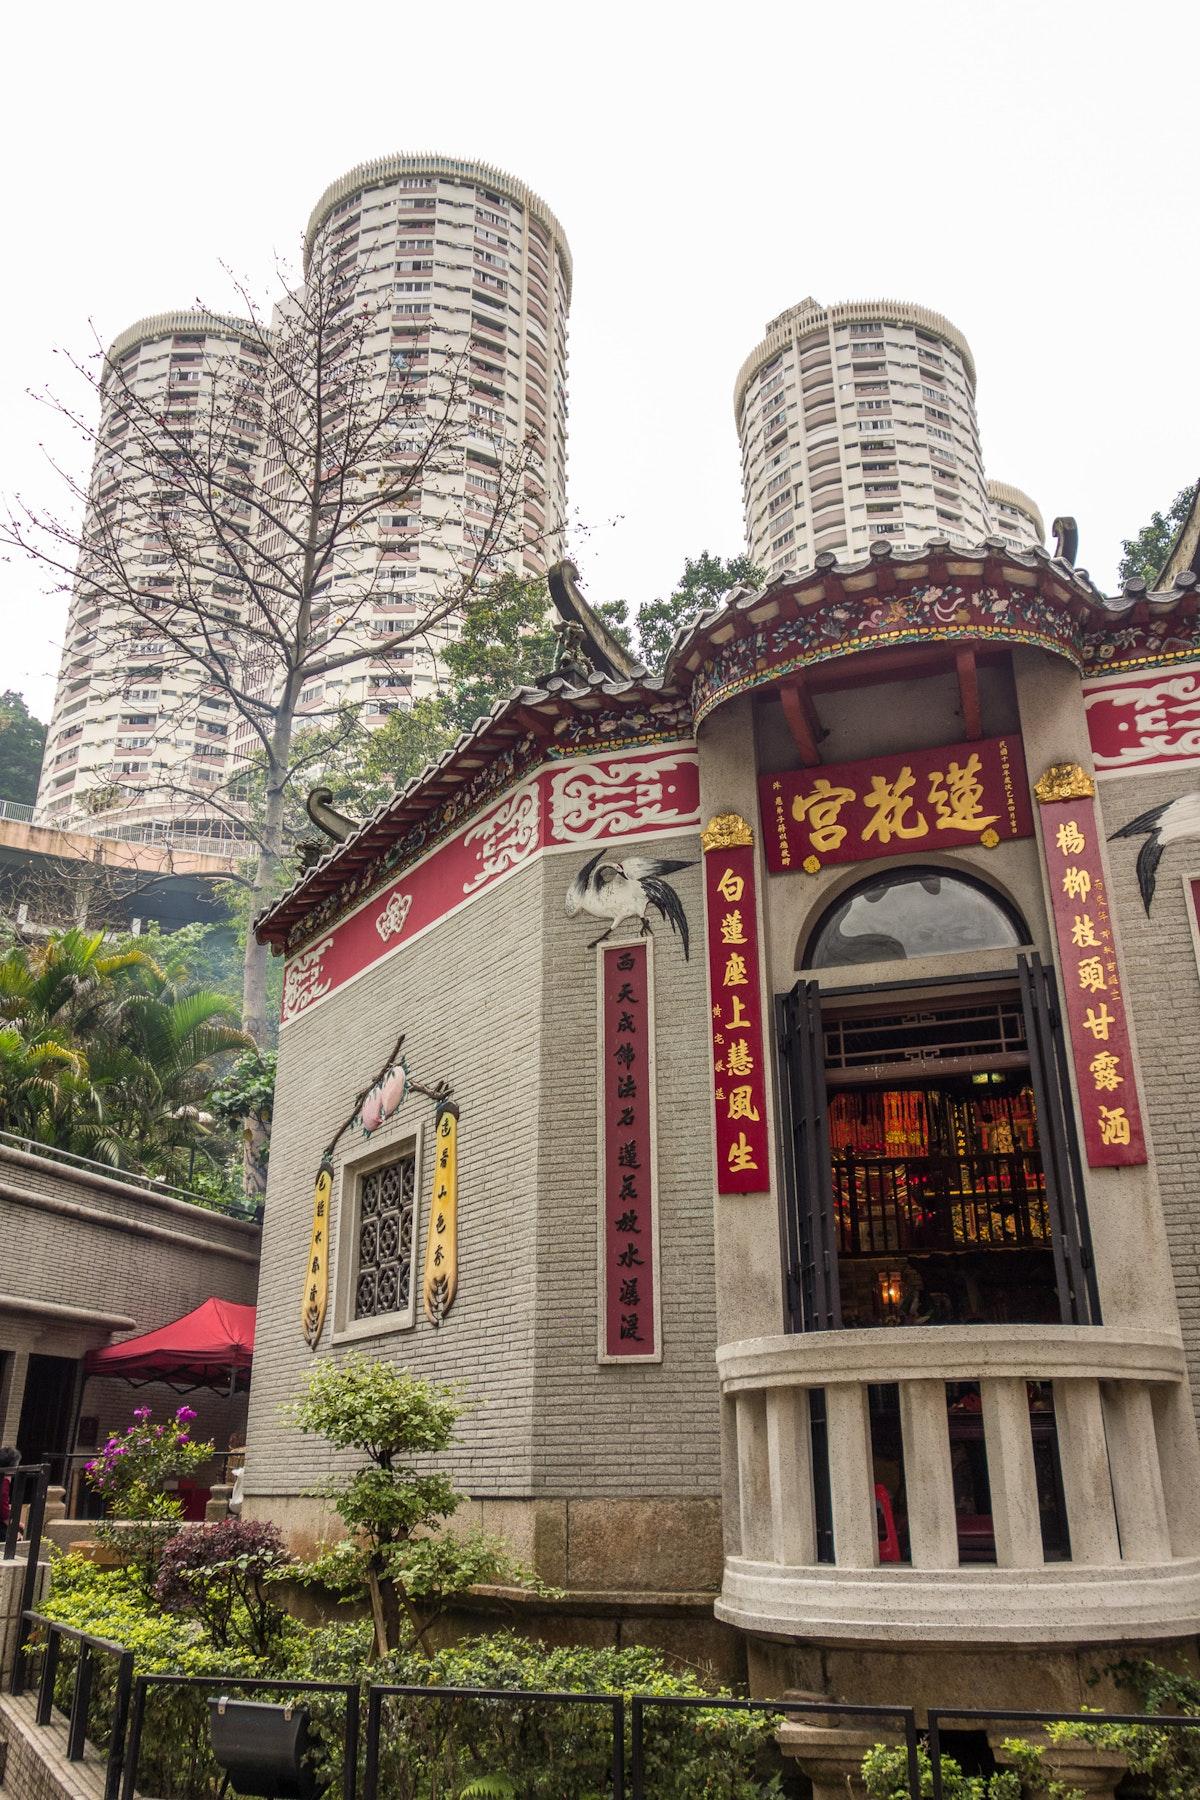 Lai Tak Tsuen on the hills of Wan Chai